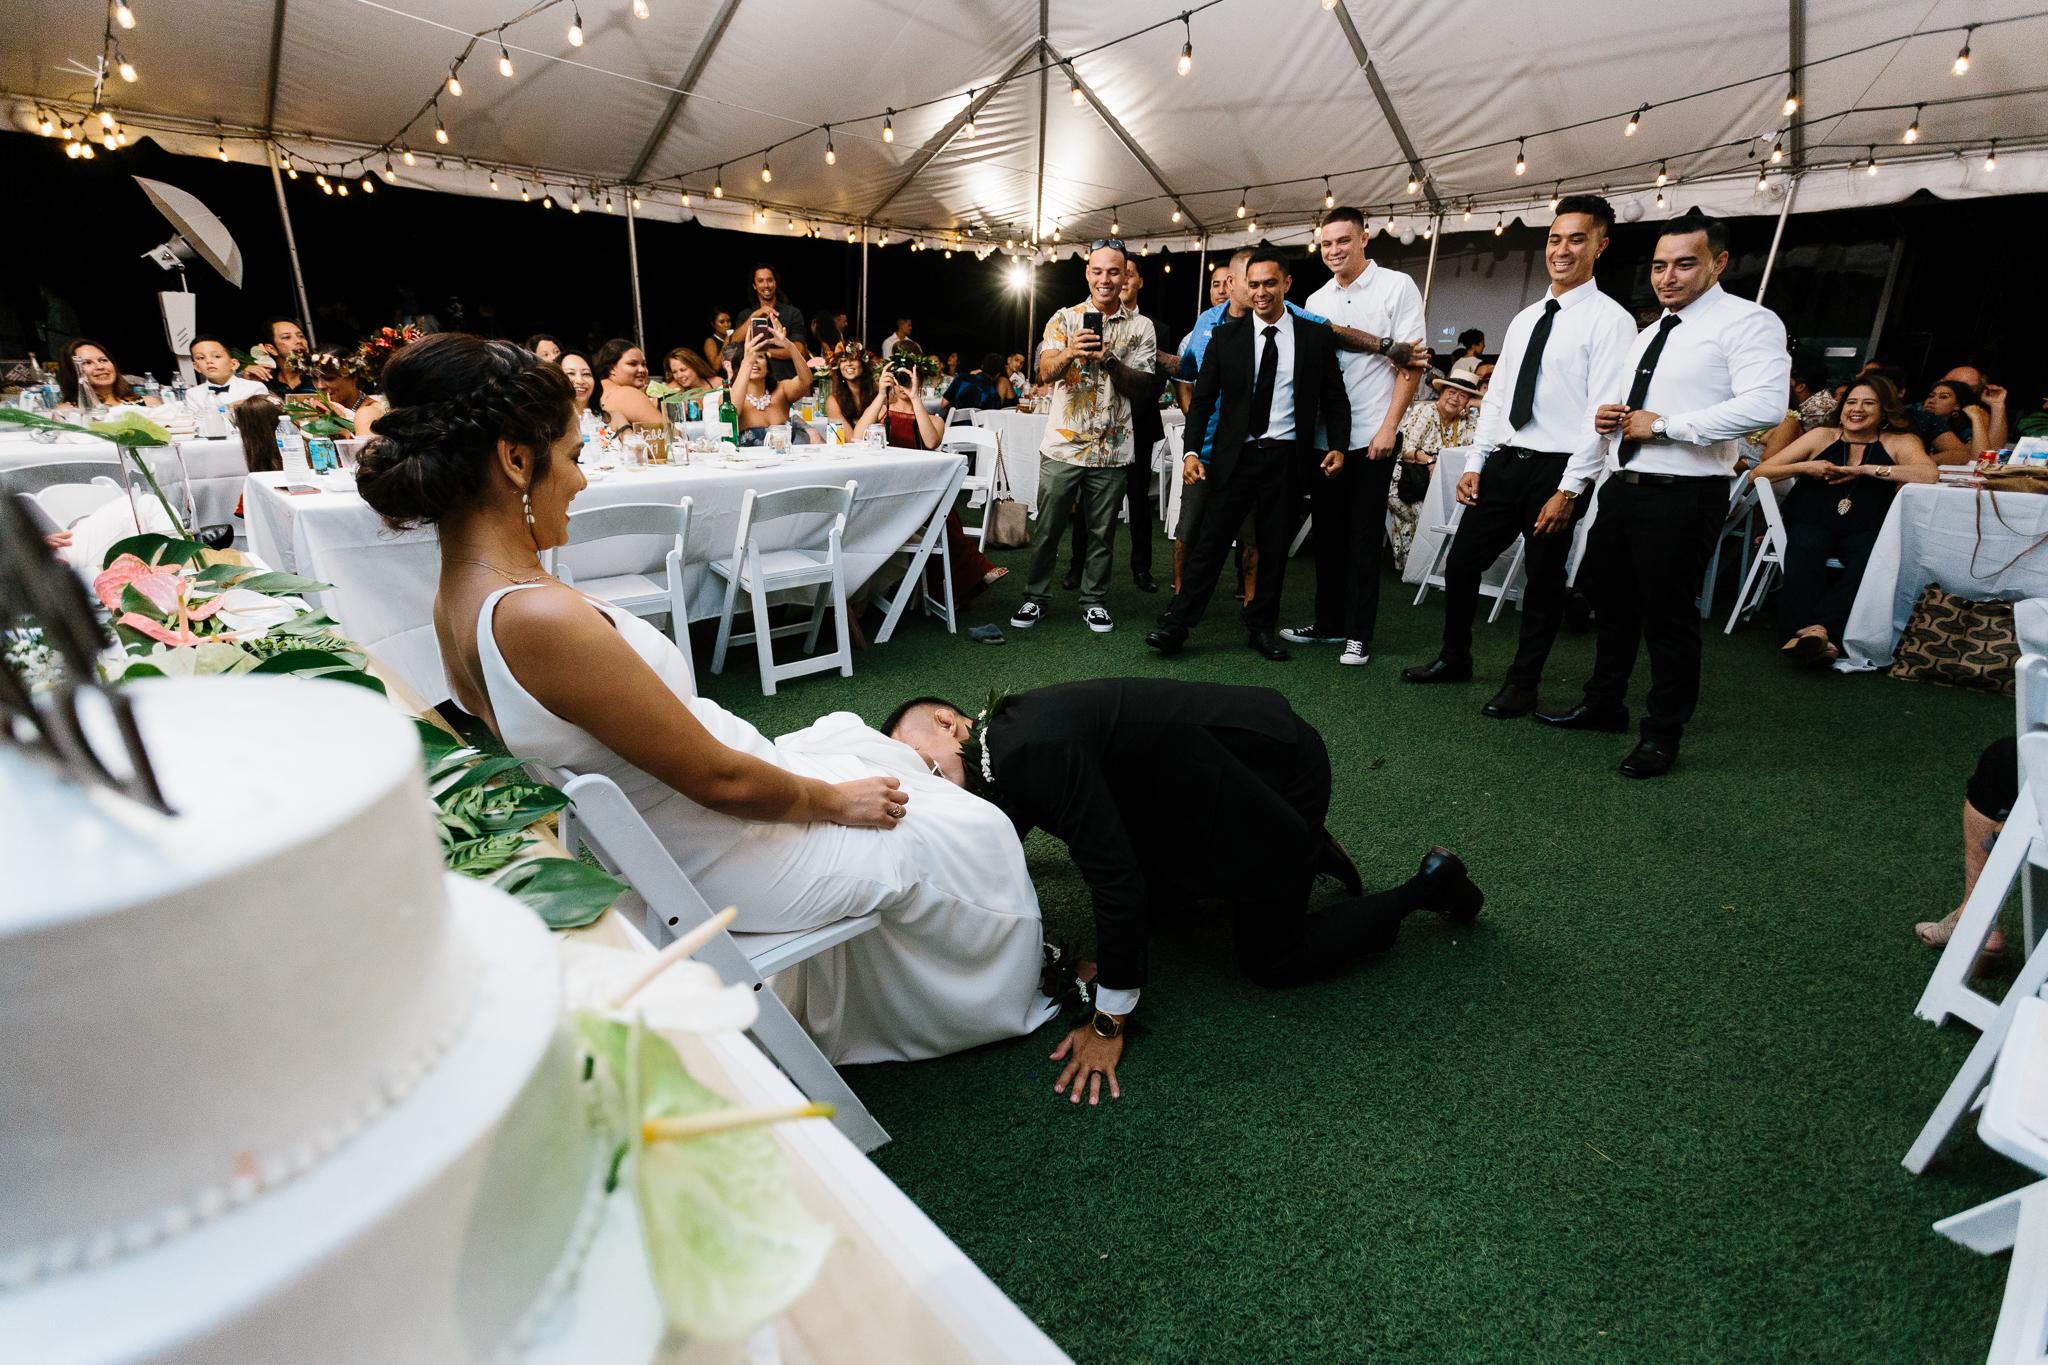 Kualoa_Ranch_Wedding_Photographer_Tone_Hawaii-55.jpg